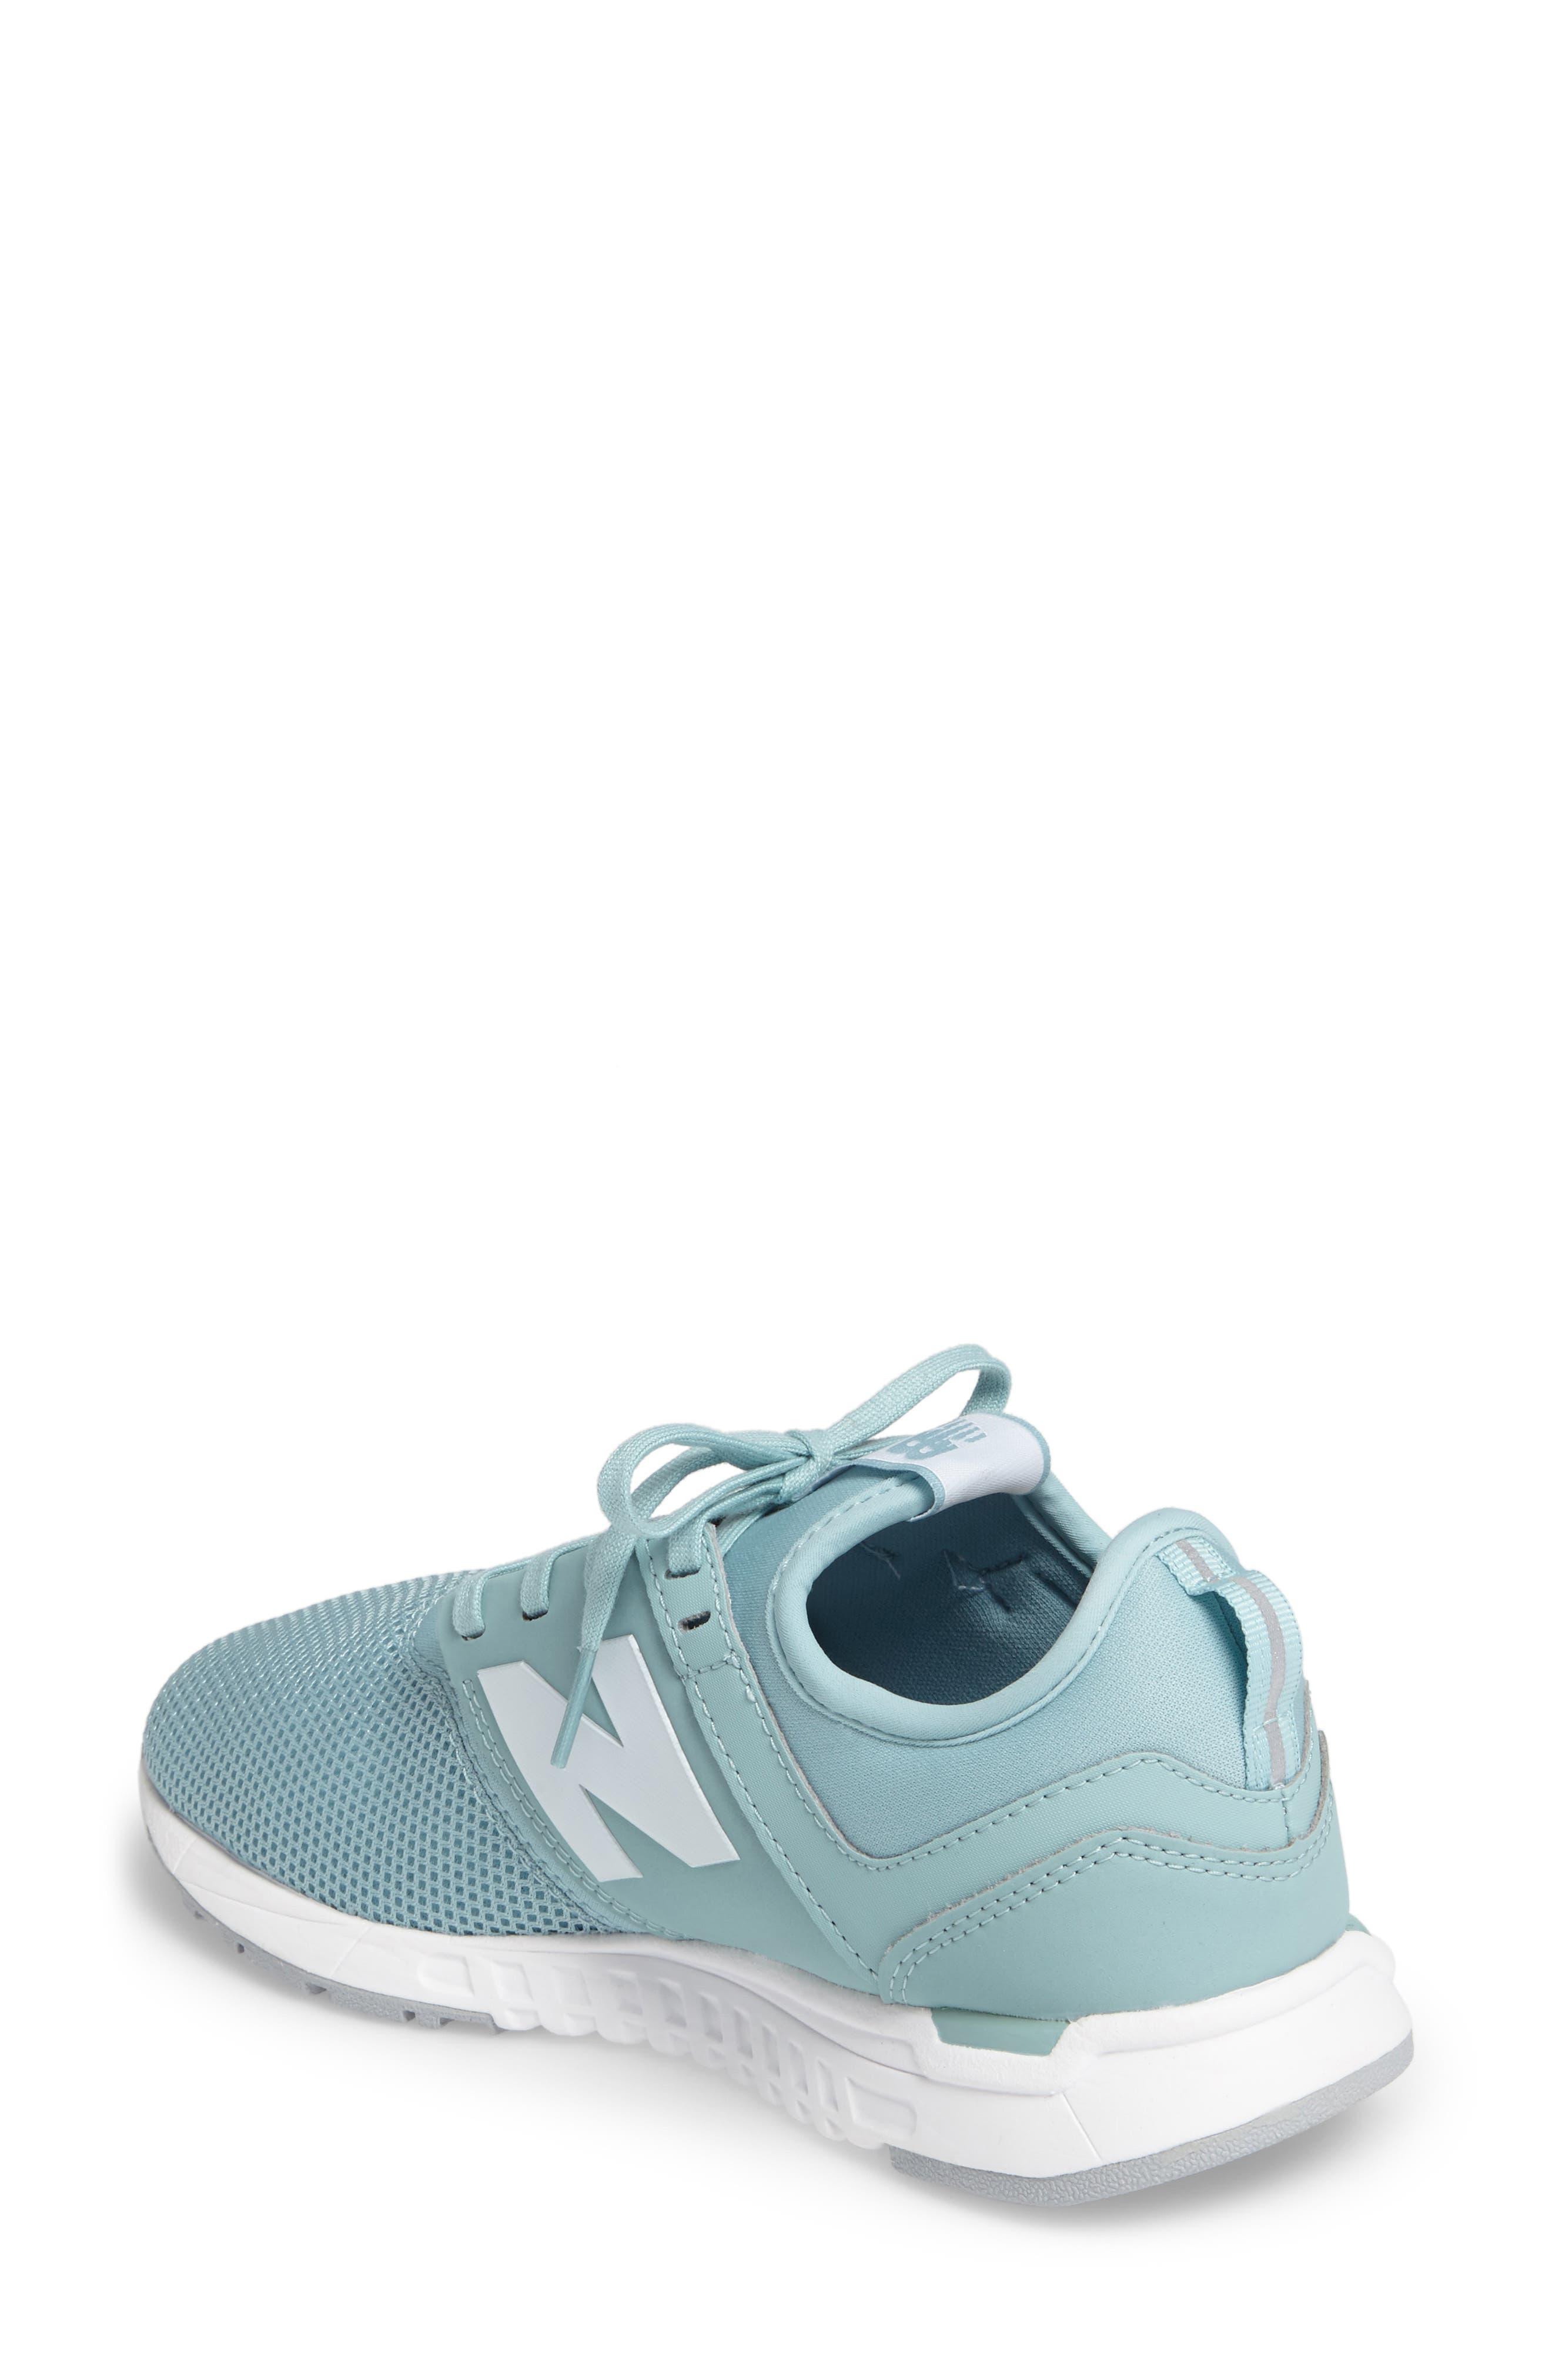 Alternate Image 2  - New Balance Sport Style 247 Sneaker (Women)